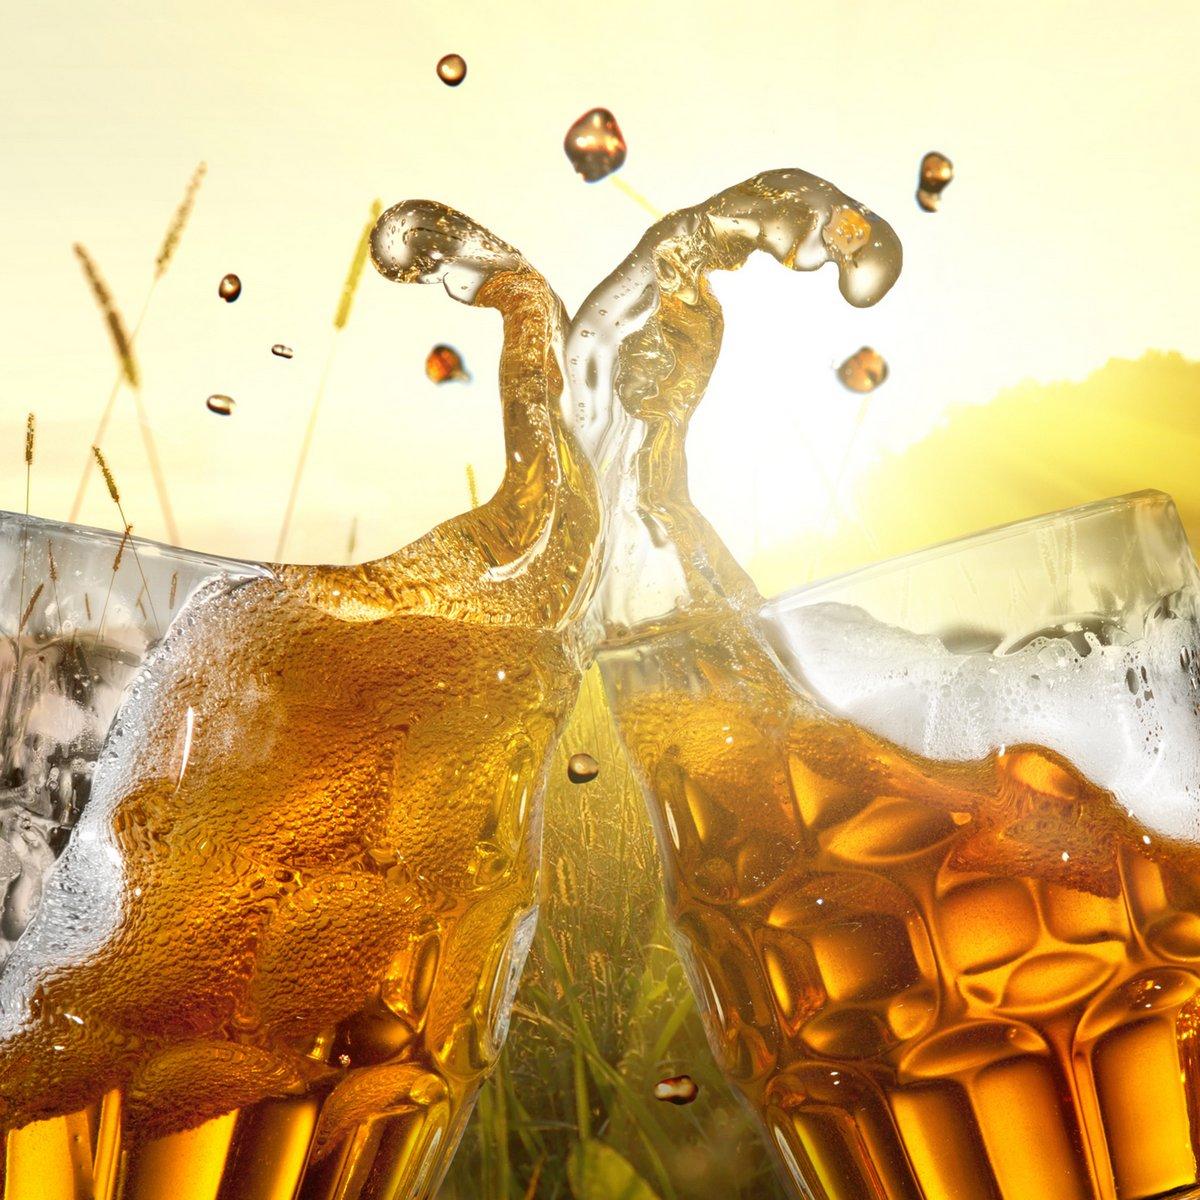 "Постер Еда и напитки ""Постер 62672275"", 20x20 см, на бумаге от Artwall"